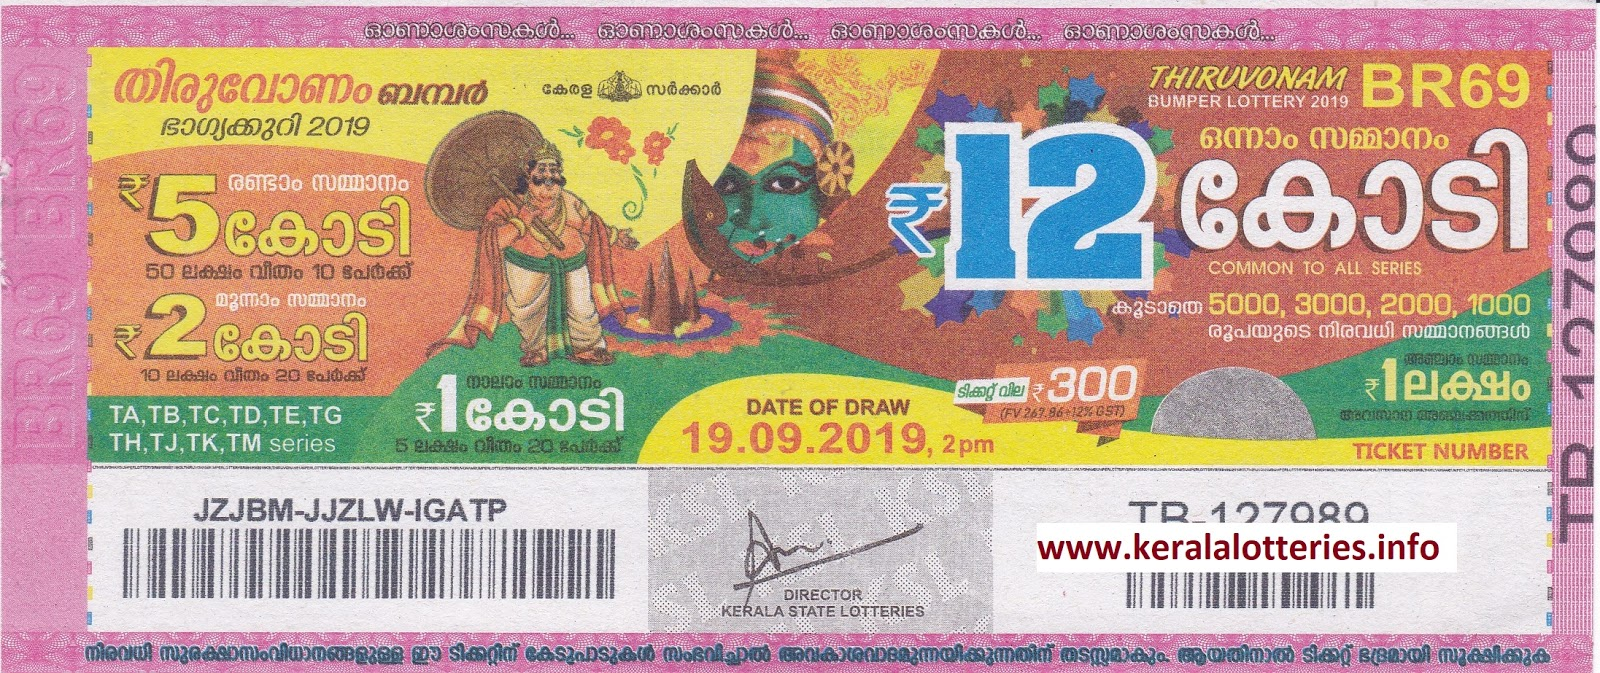 Next Kerala Bumper Lottery